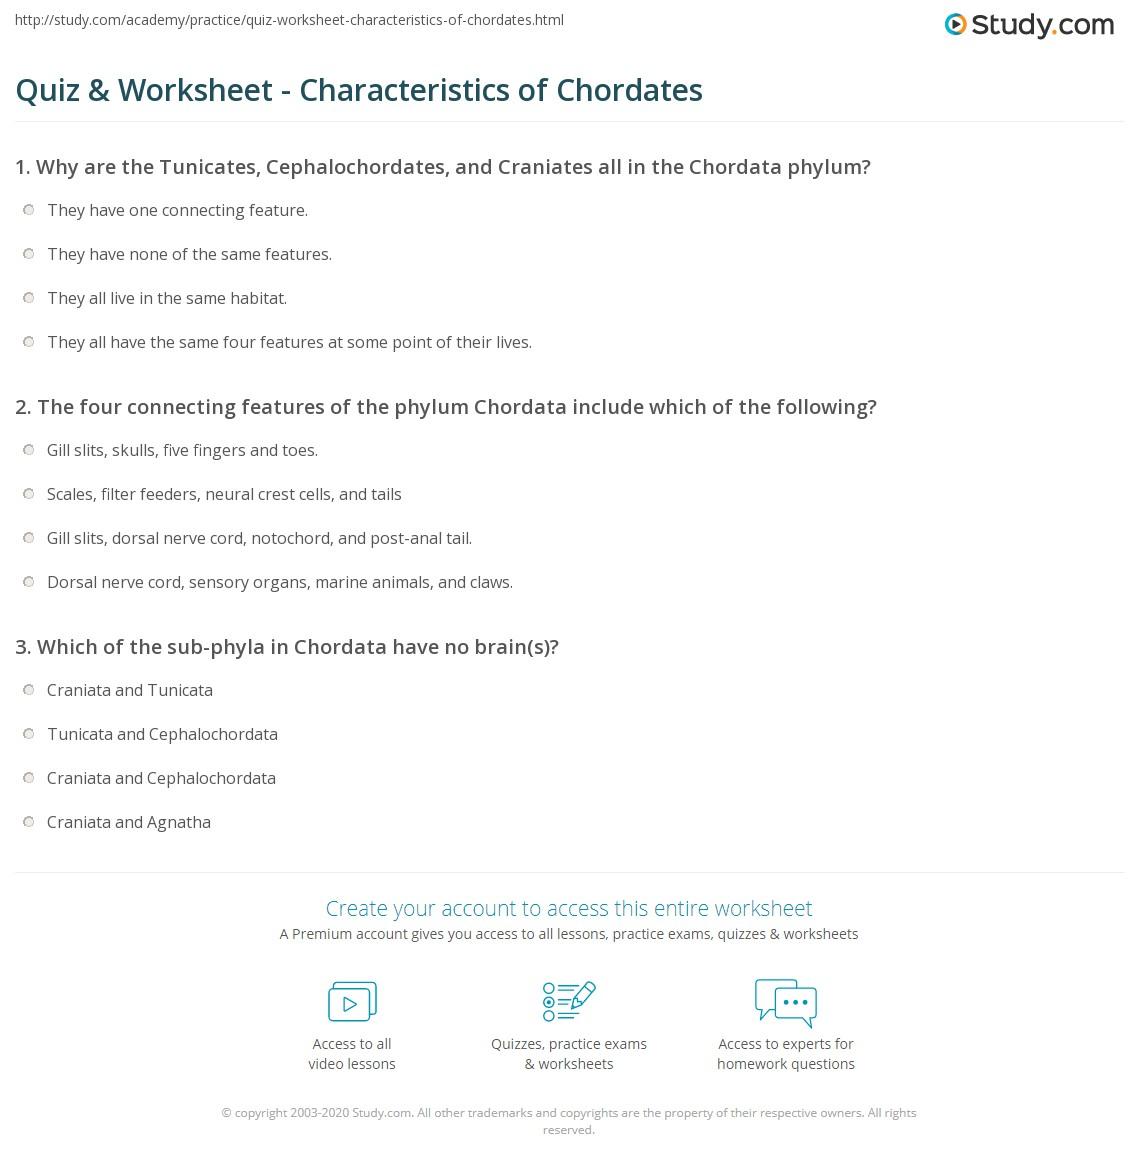 quiz worksheet characteristics of chordates study com rh study com Cladogram of Chordates Marine Chordates